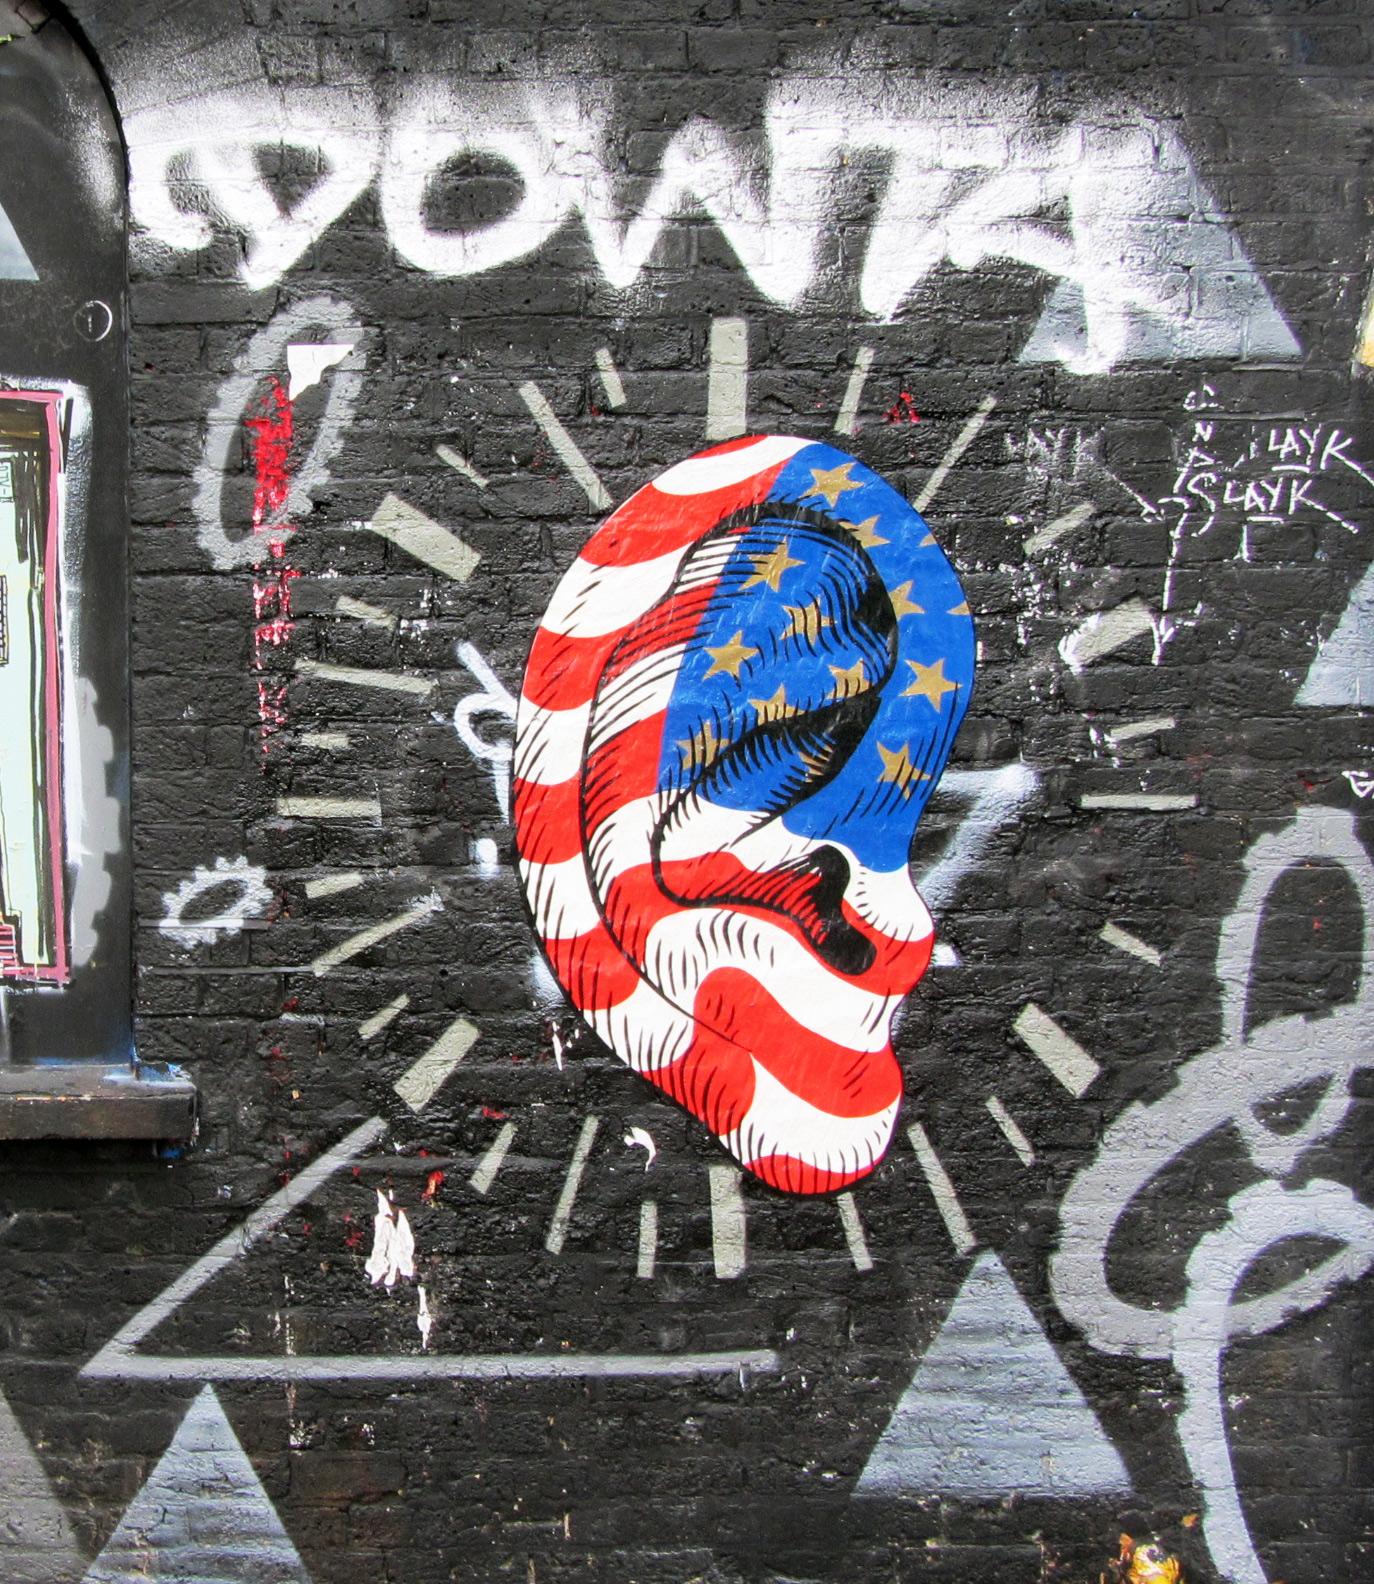 Street Art London Shoreditch -Brick Lane